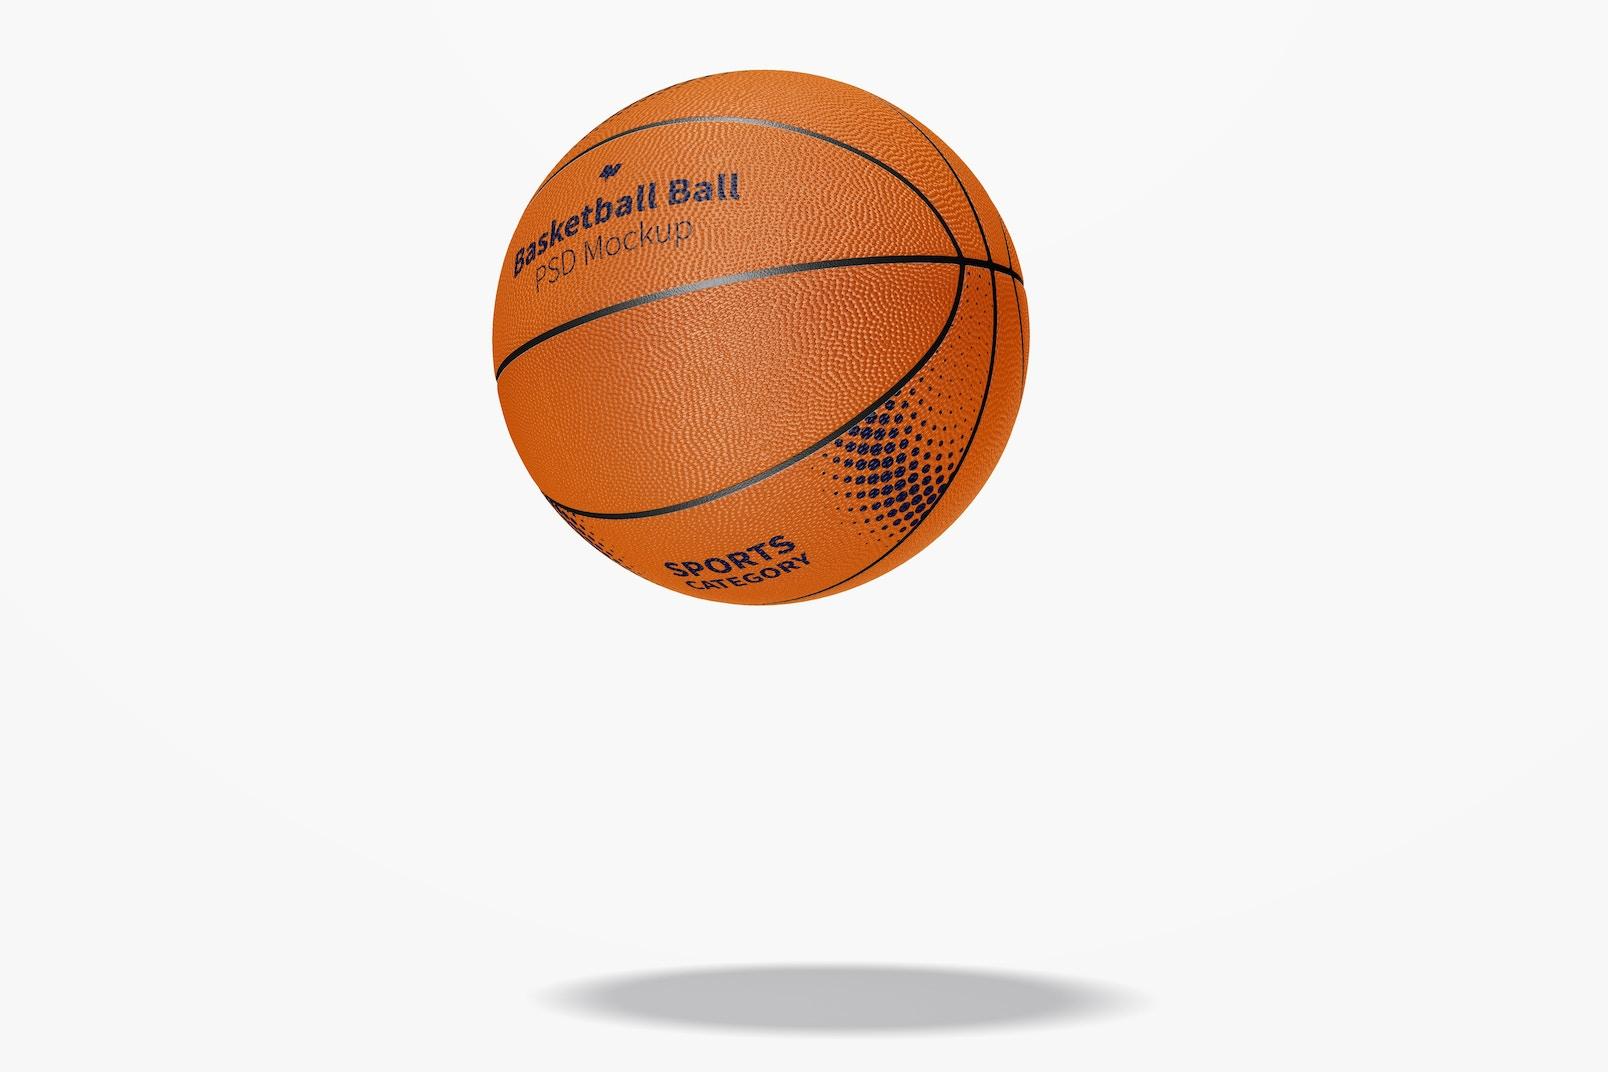 Basketball Ball Mockup, Falling